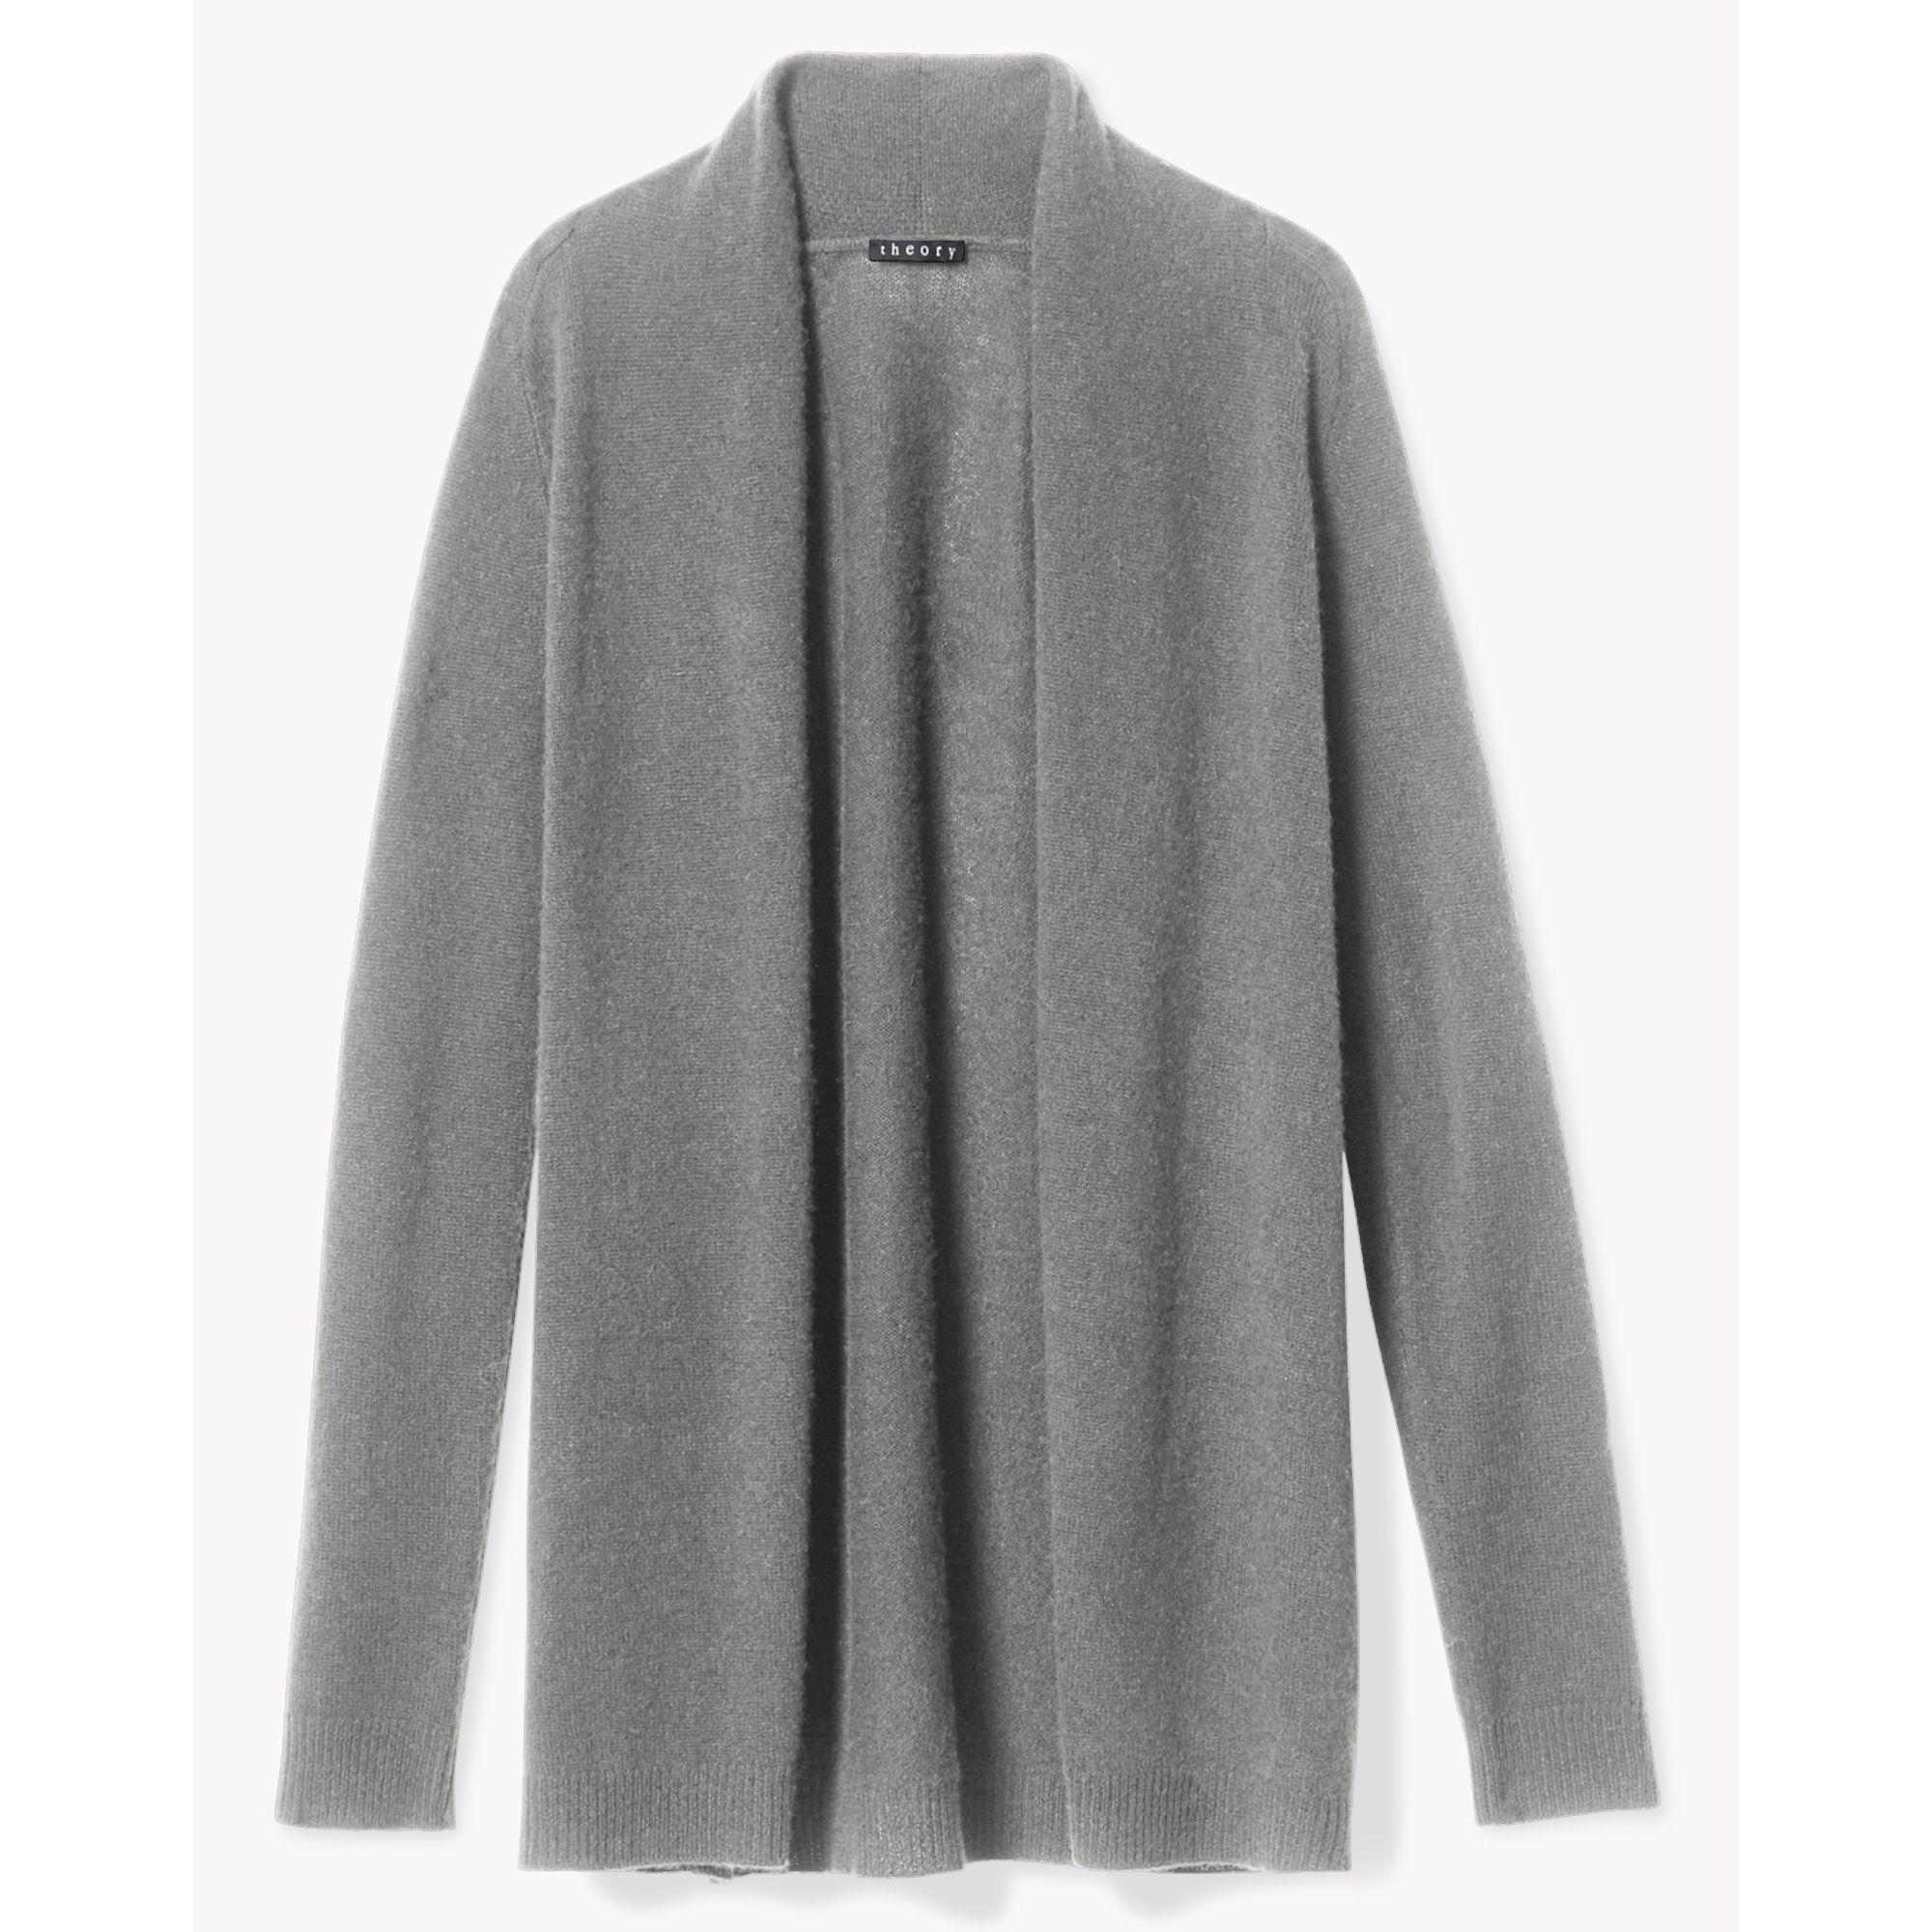 Theory Light Wool Open Cardigan in Gray | Lyst